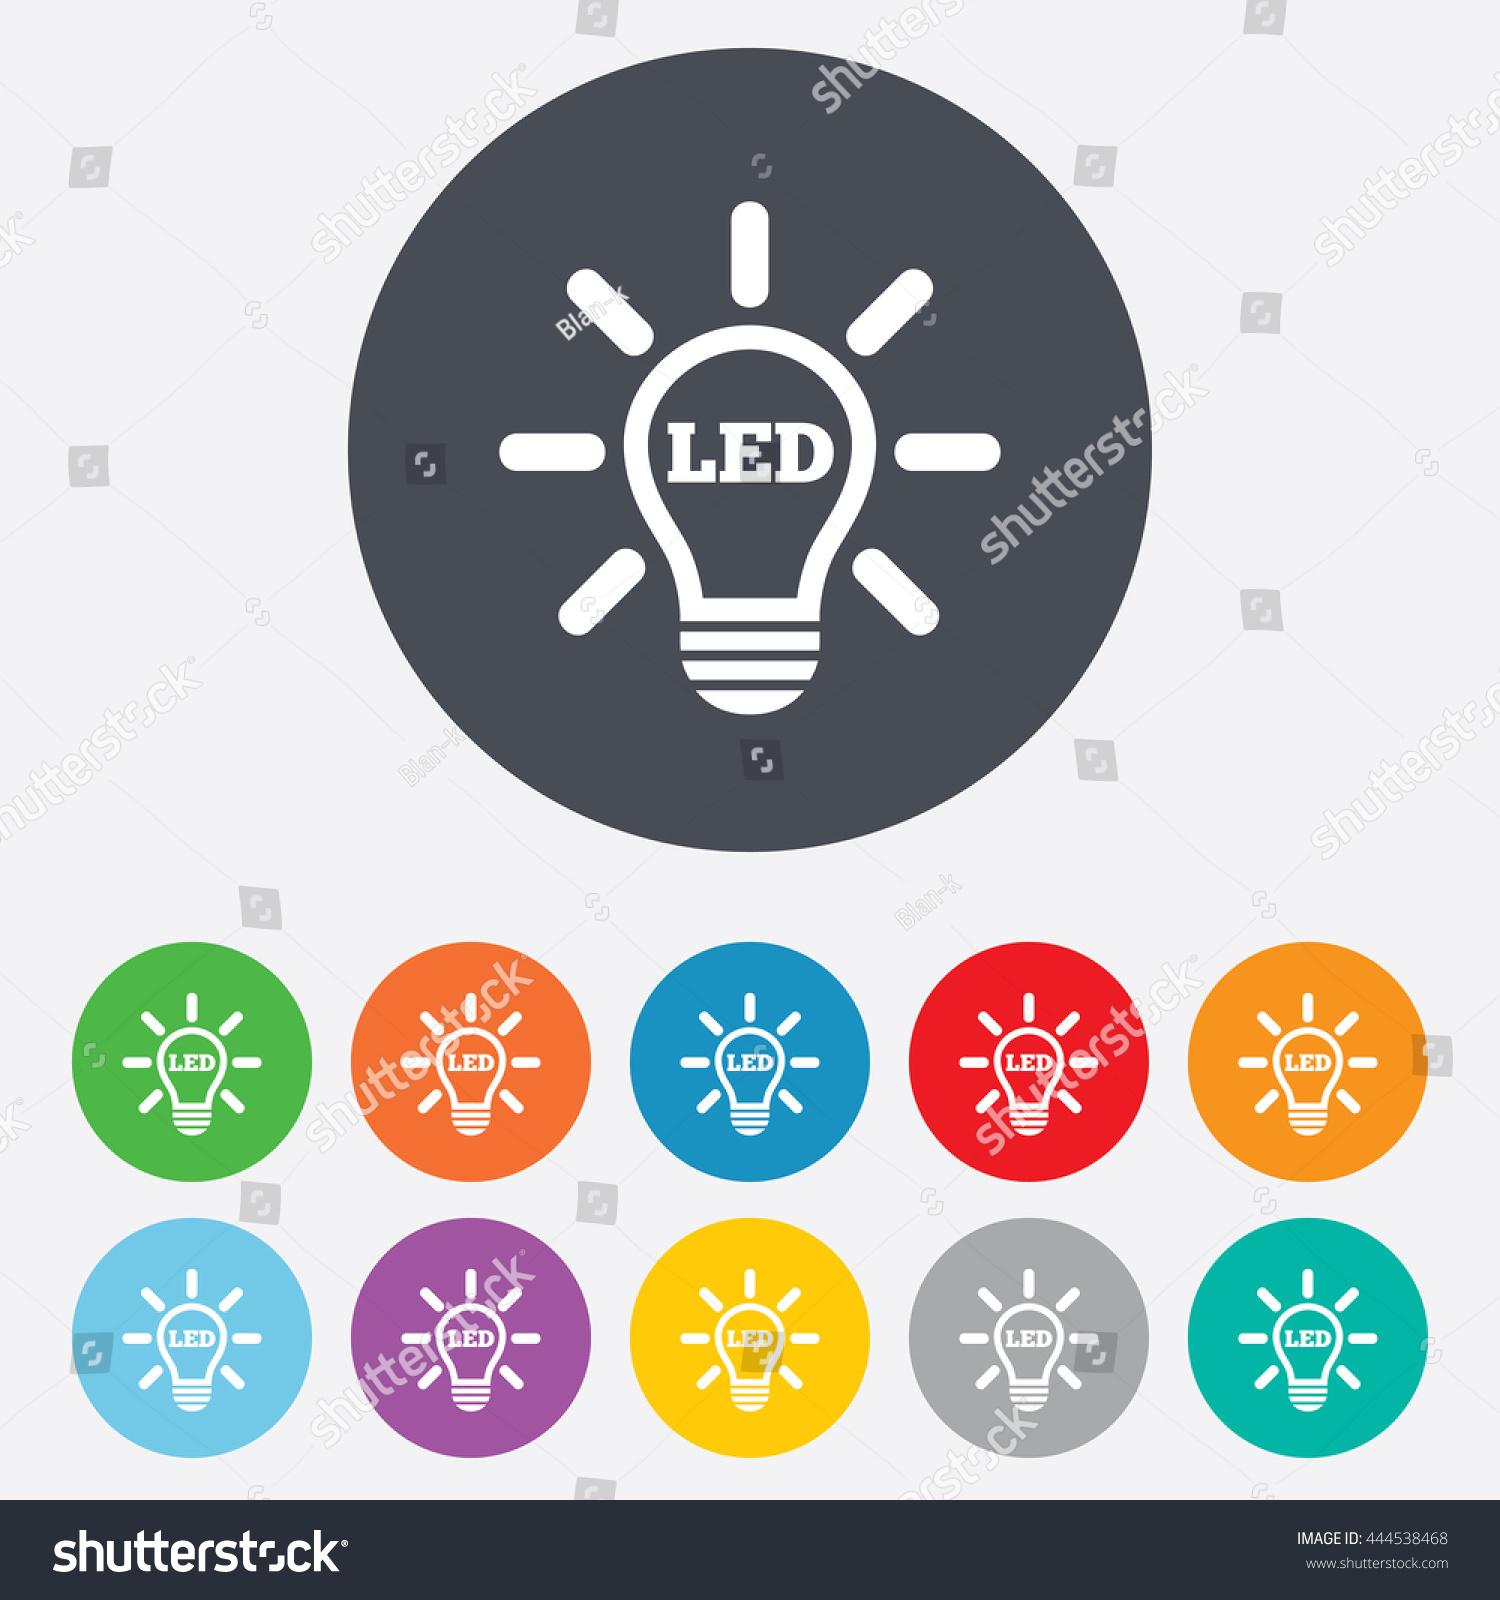 Led Light Lamp Icon Energy Symbol Stock Vector 2018 444538468